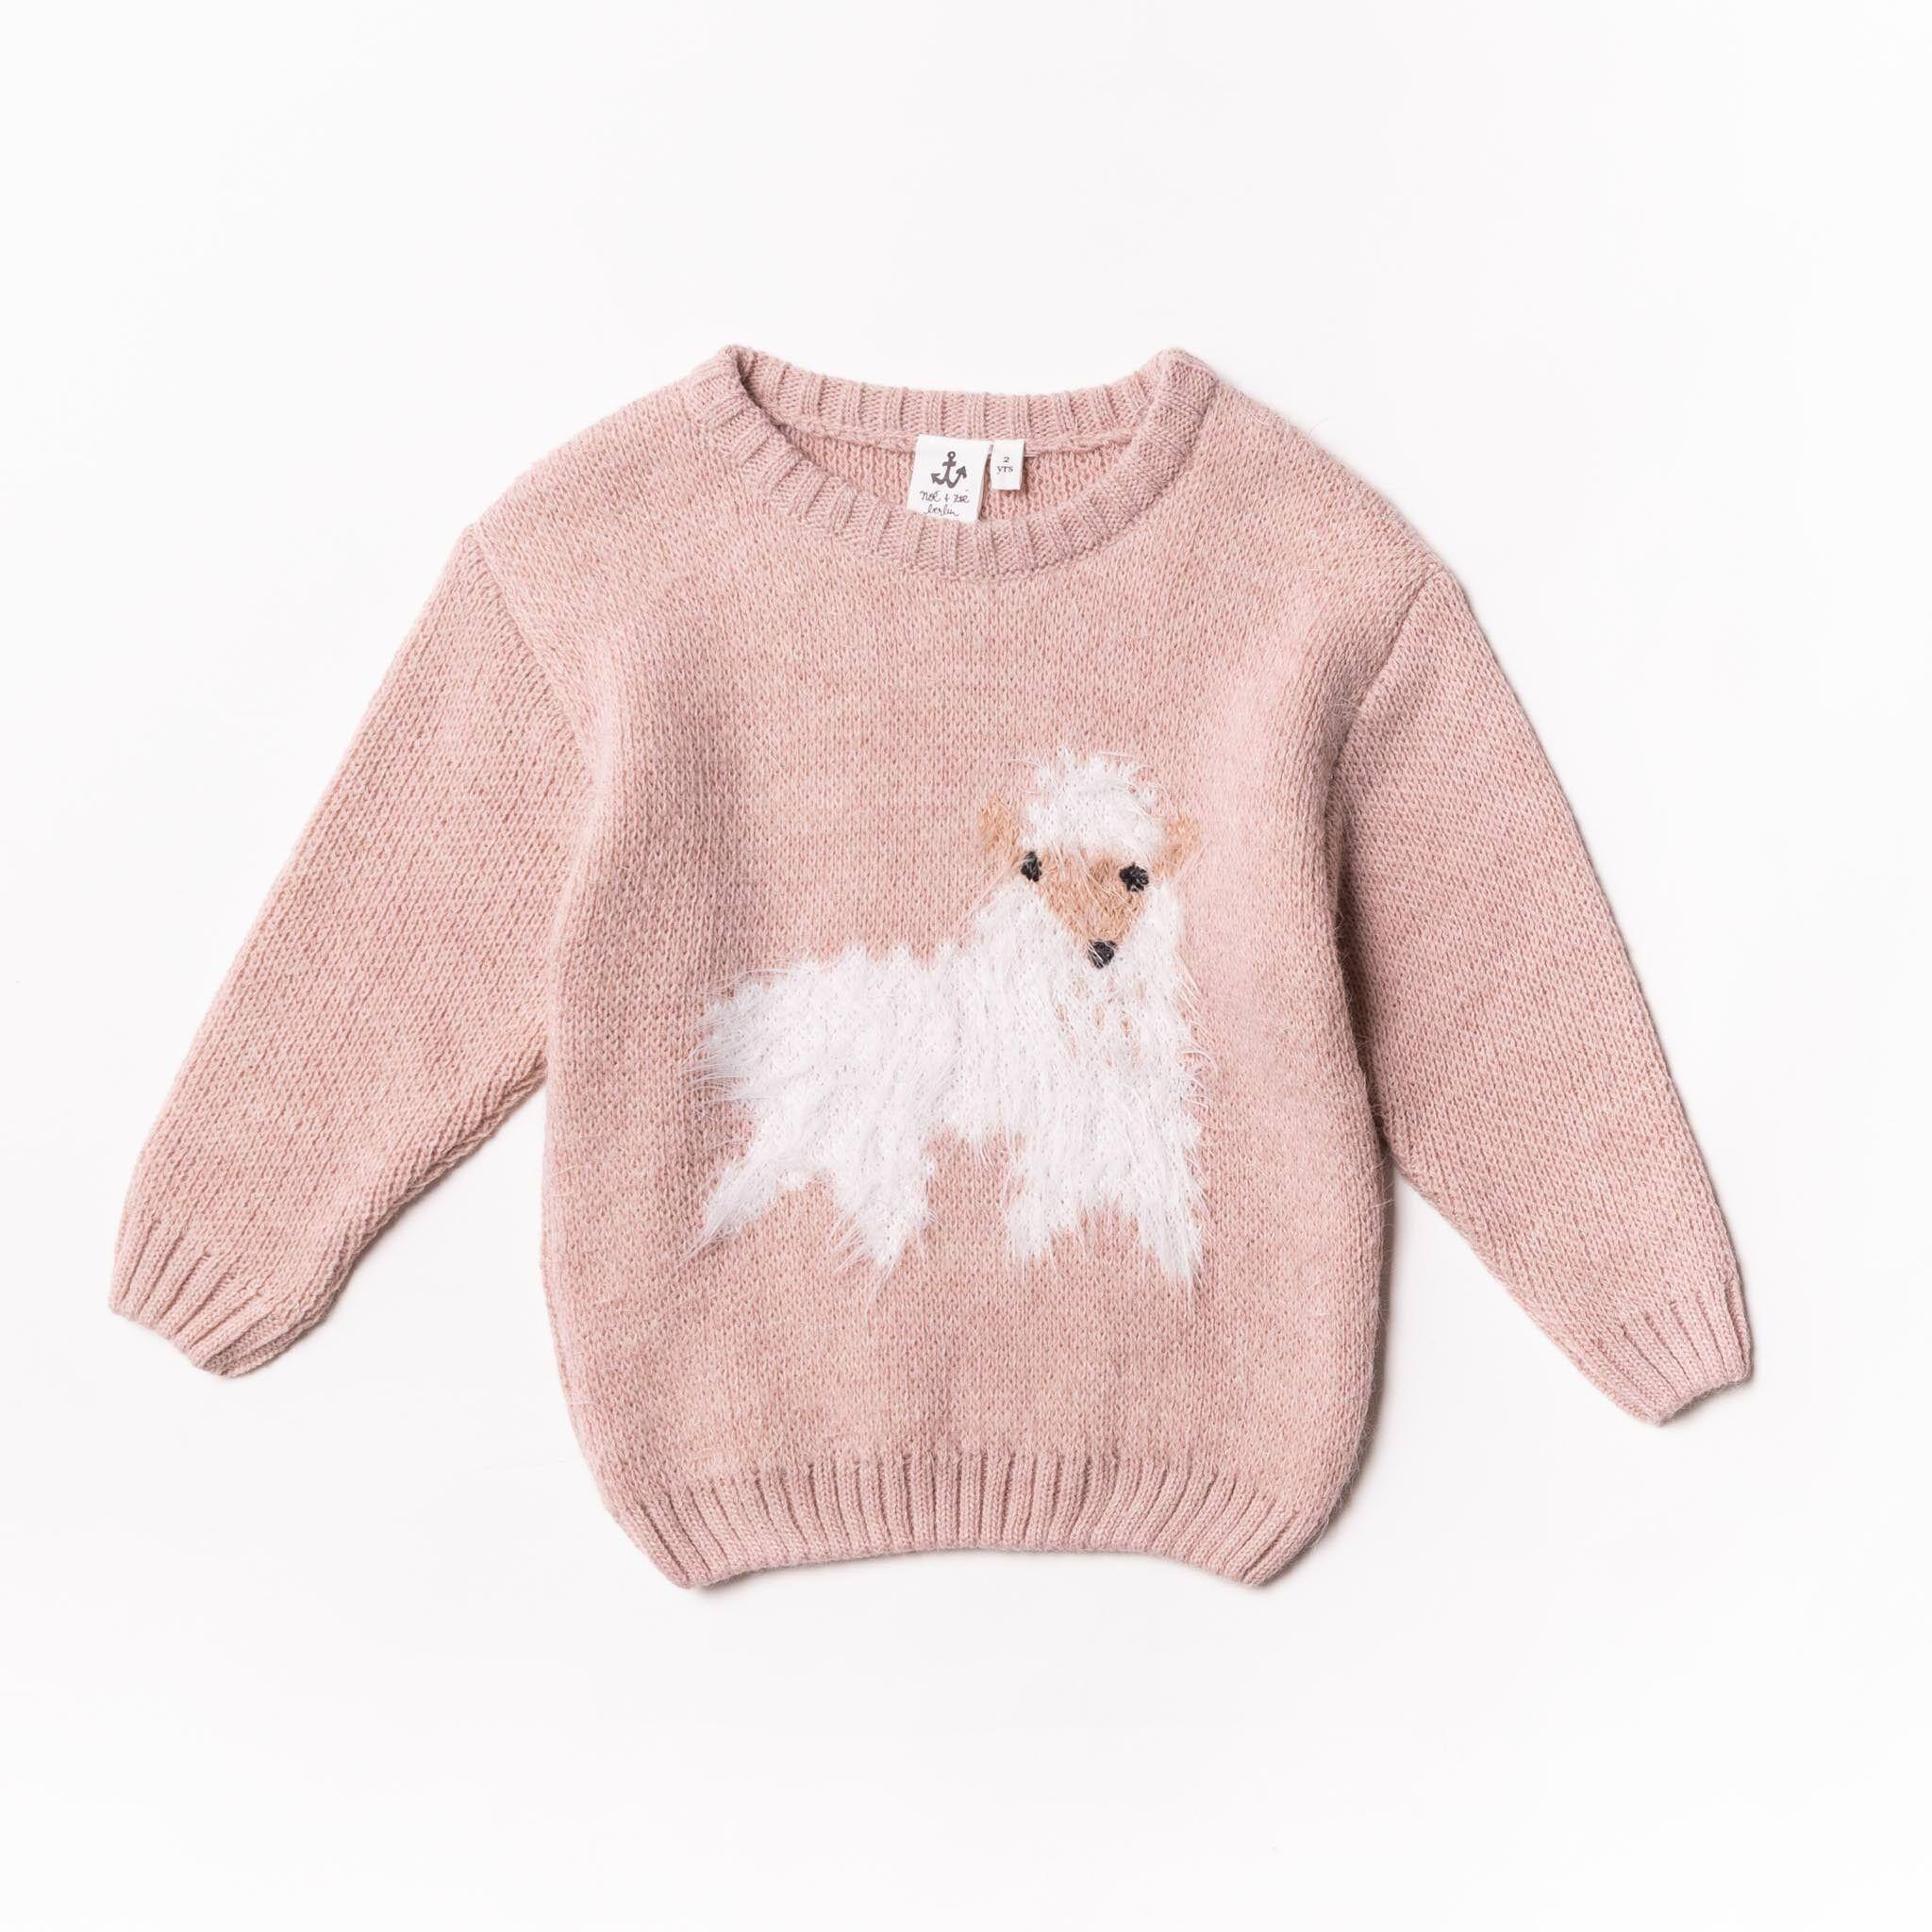 Noe & Zoe Lama Sweater